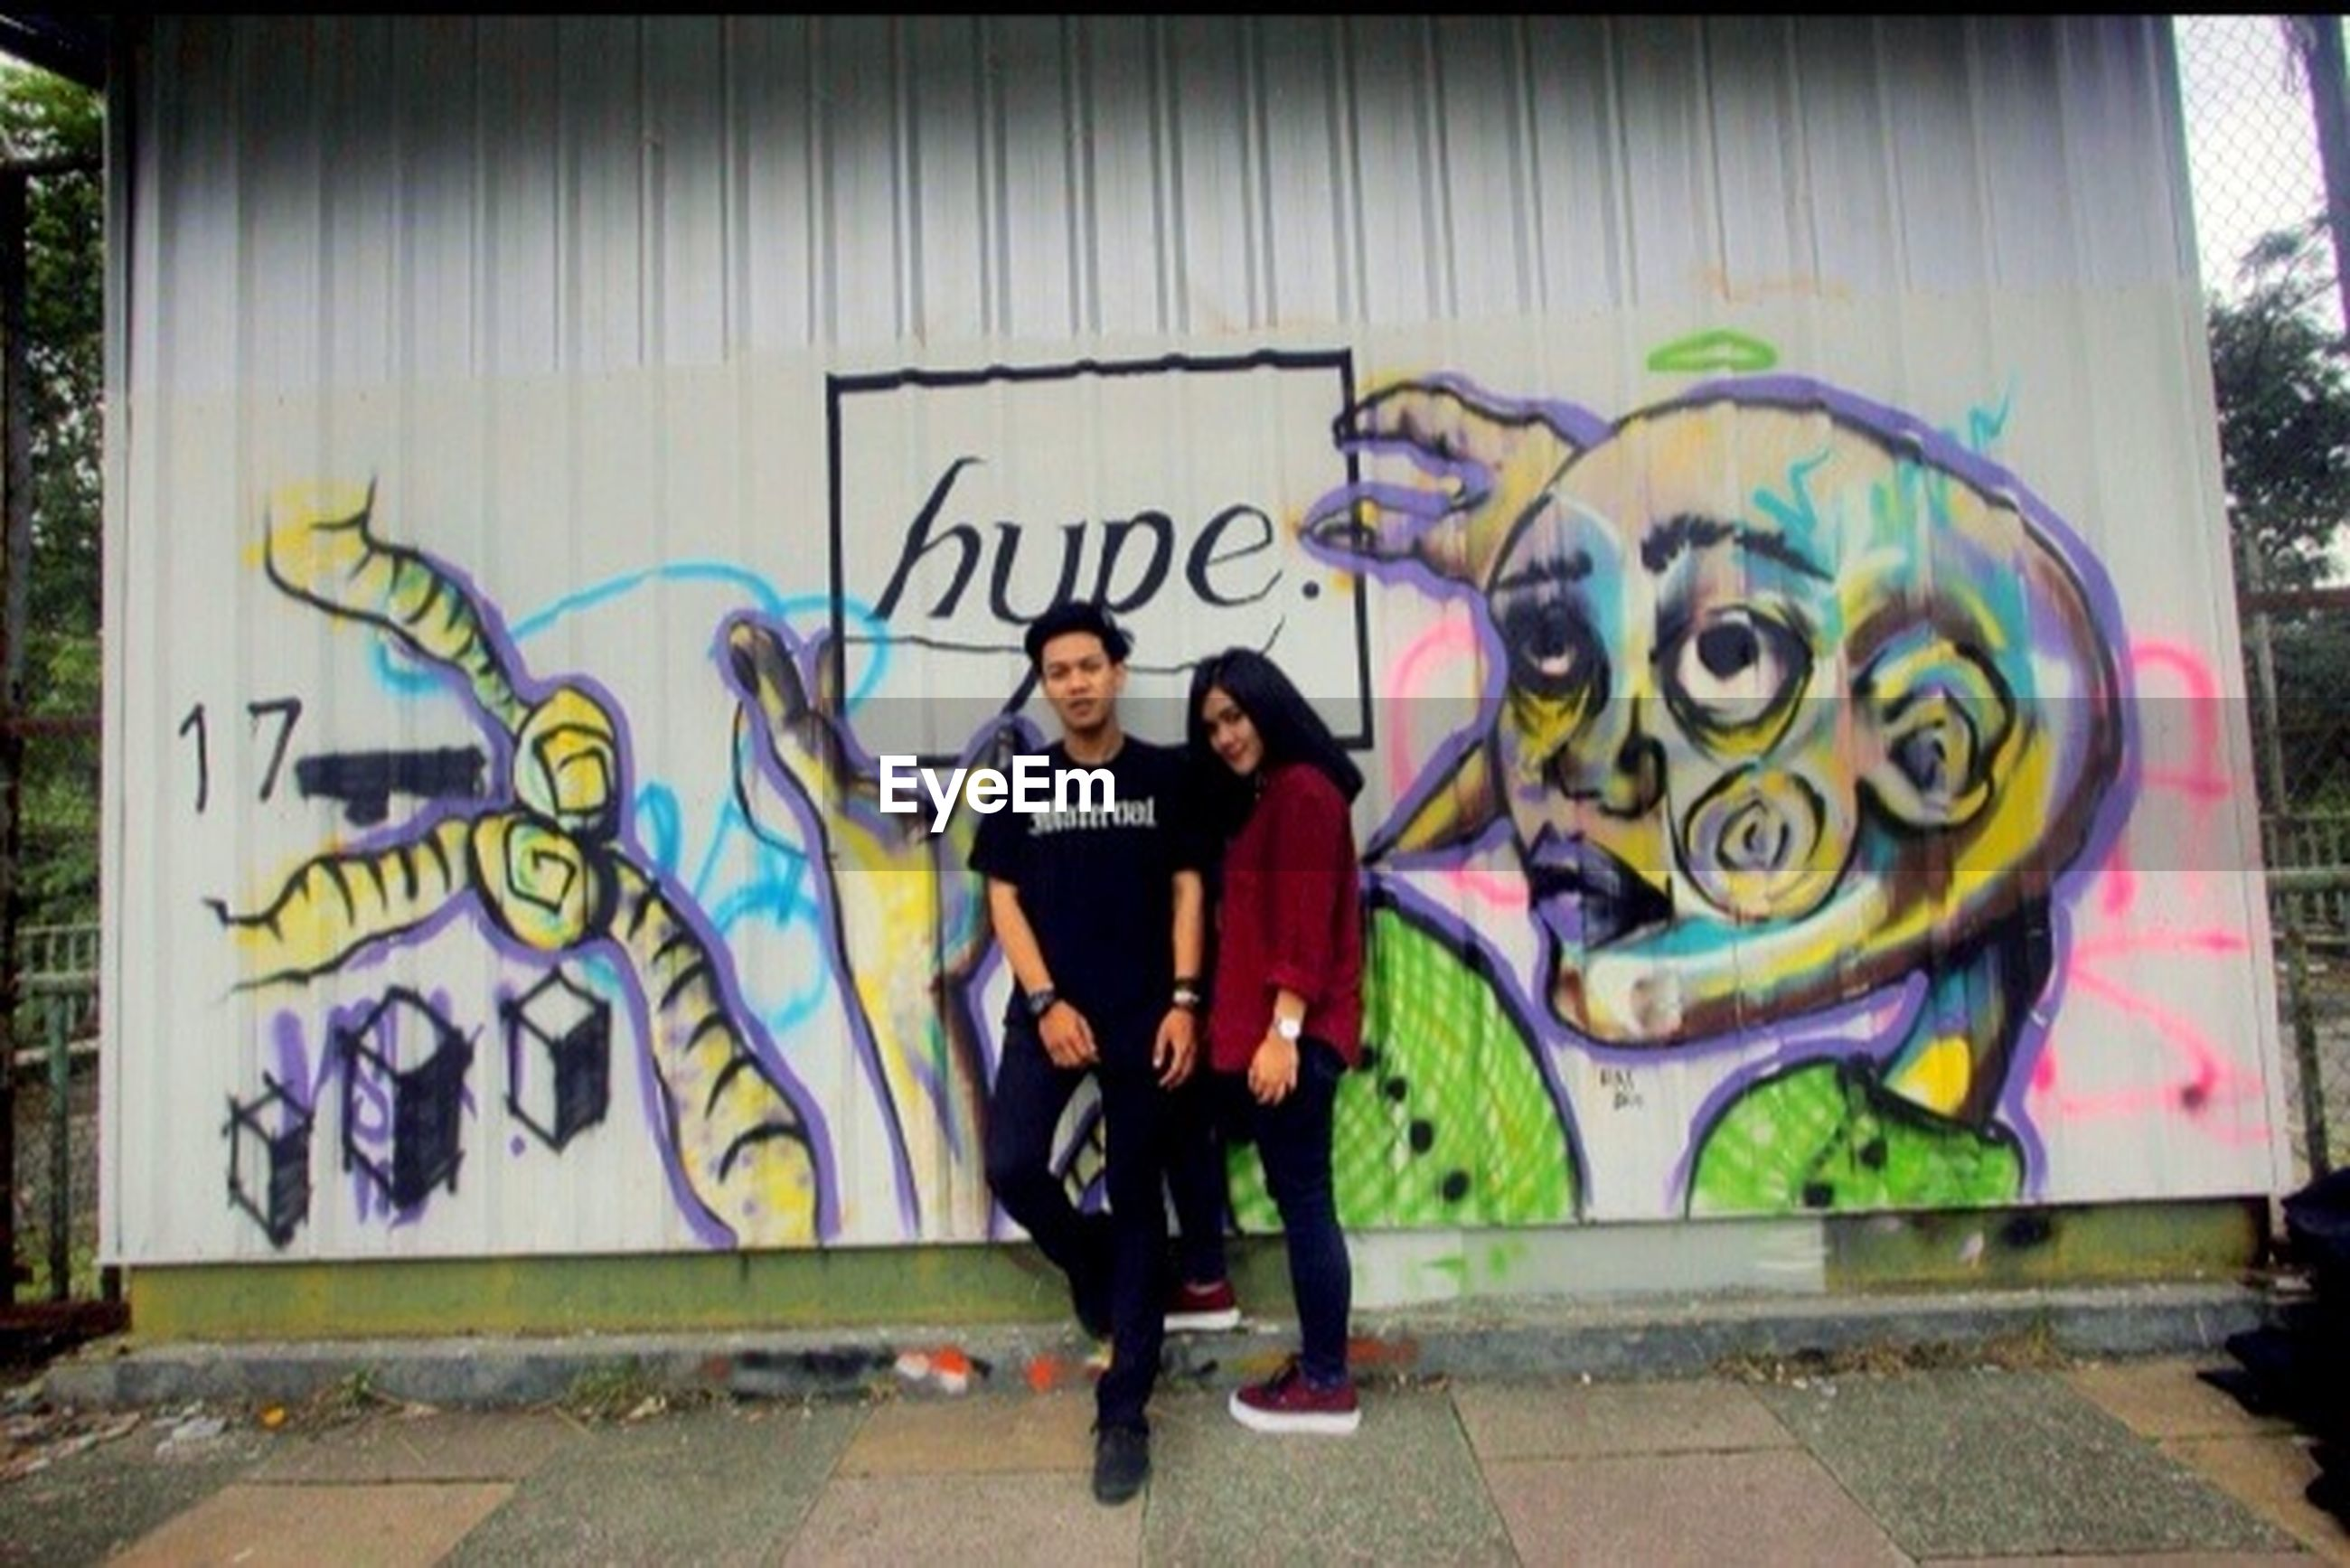 graffiti, art, creativity, art and craft, text, lifestyles, human representation, full length, wall - building feature, built structure, architecture, leisure activity, street, building exterior, western script, communication, street art